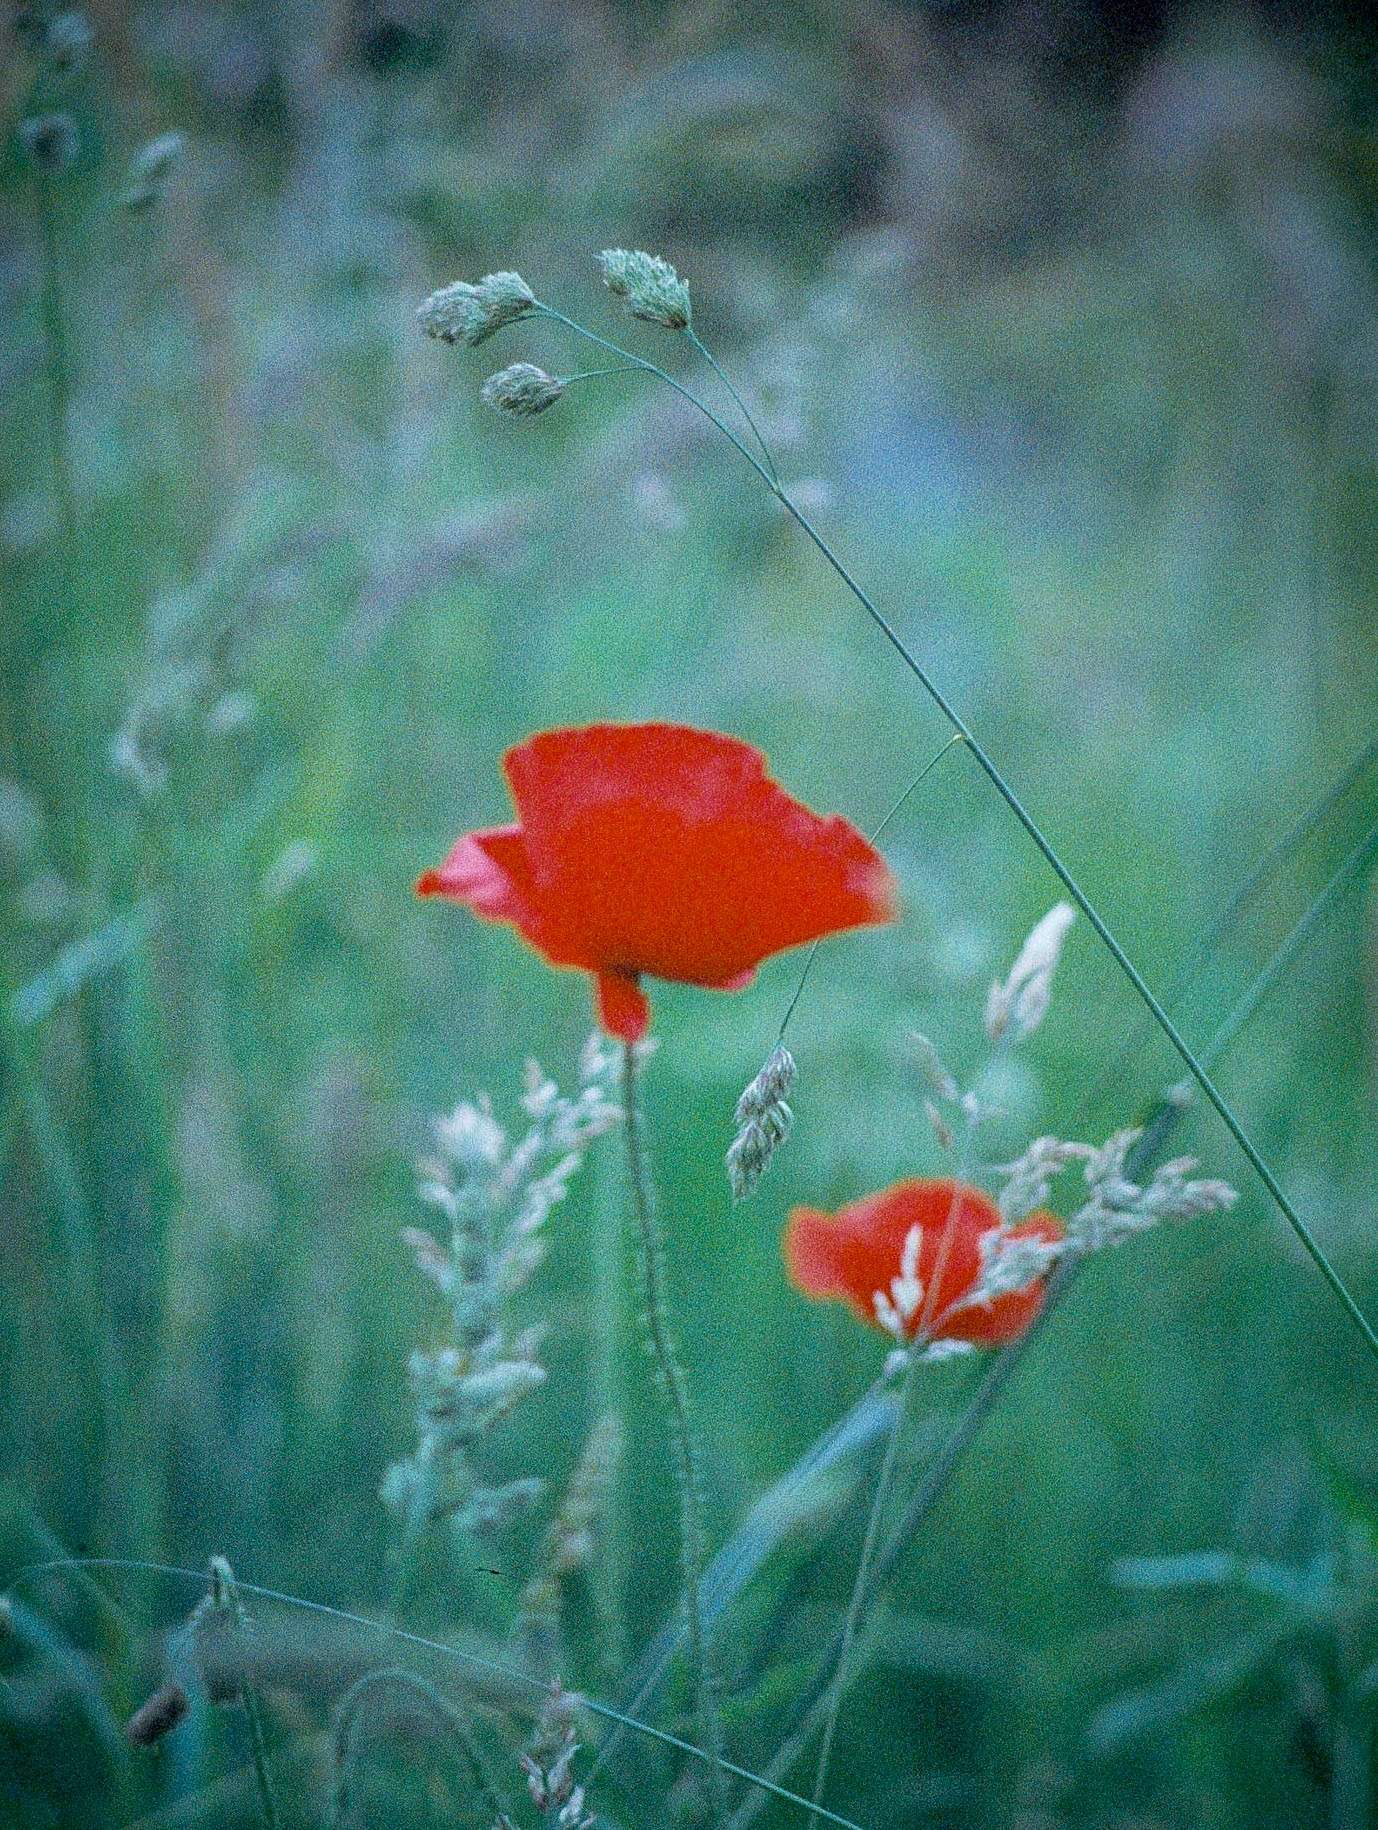 Untitled by Paul Theunis Fotograaf